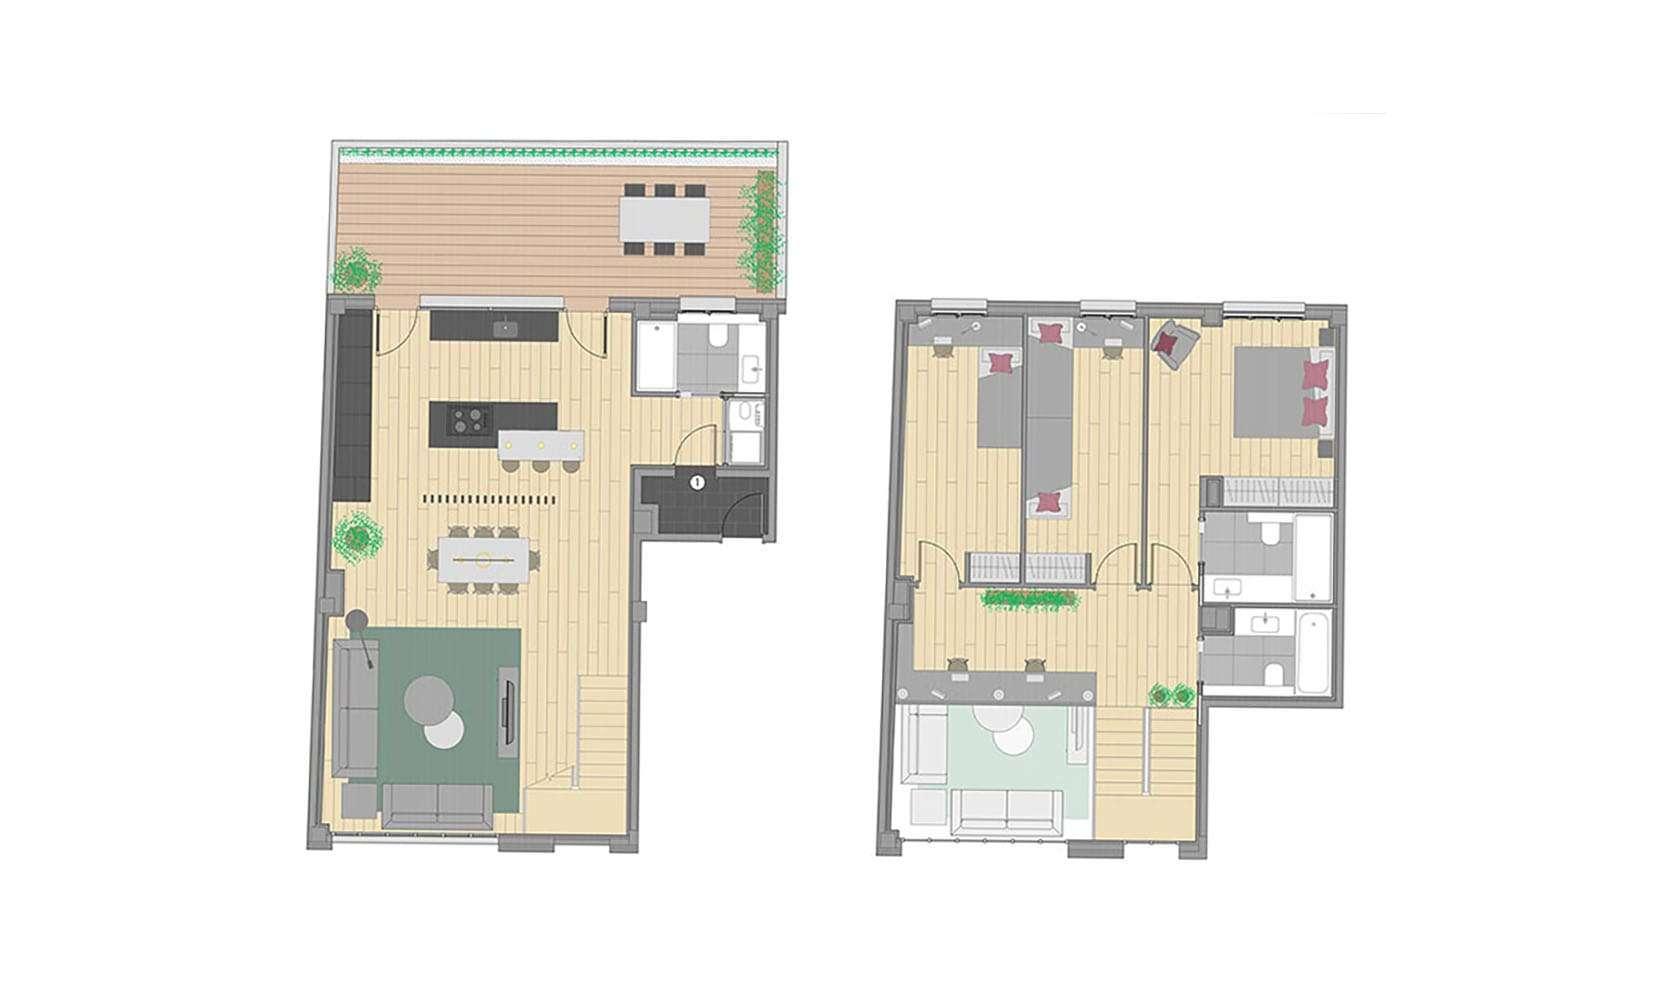 pisos-obra-nueva-gracia-barcelona-plano-2-min